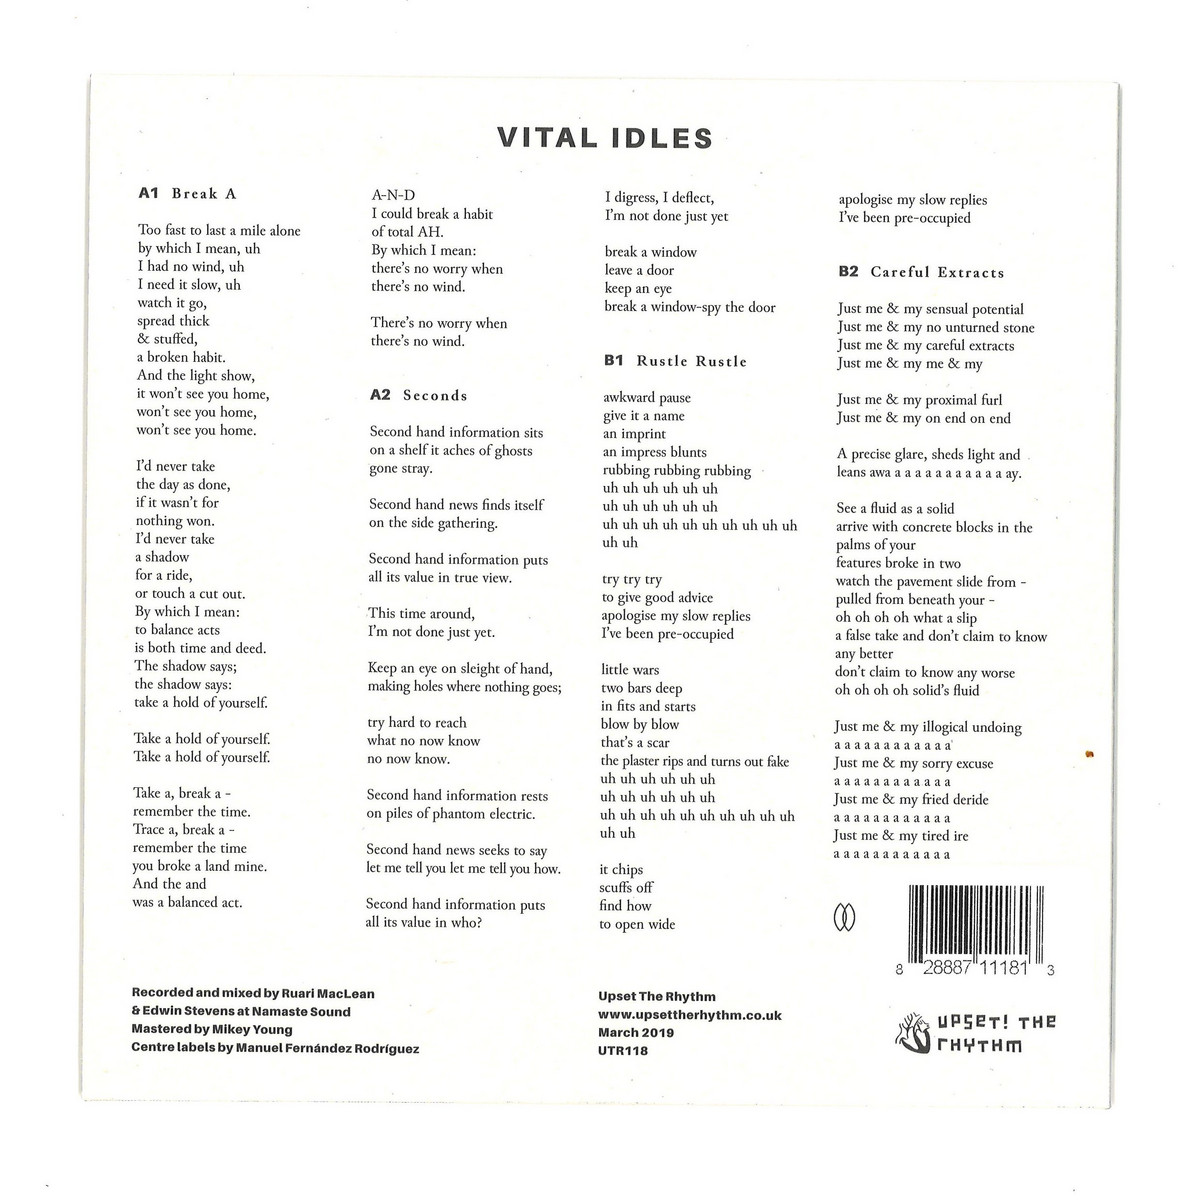 deejay de - Upset the Rhythm